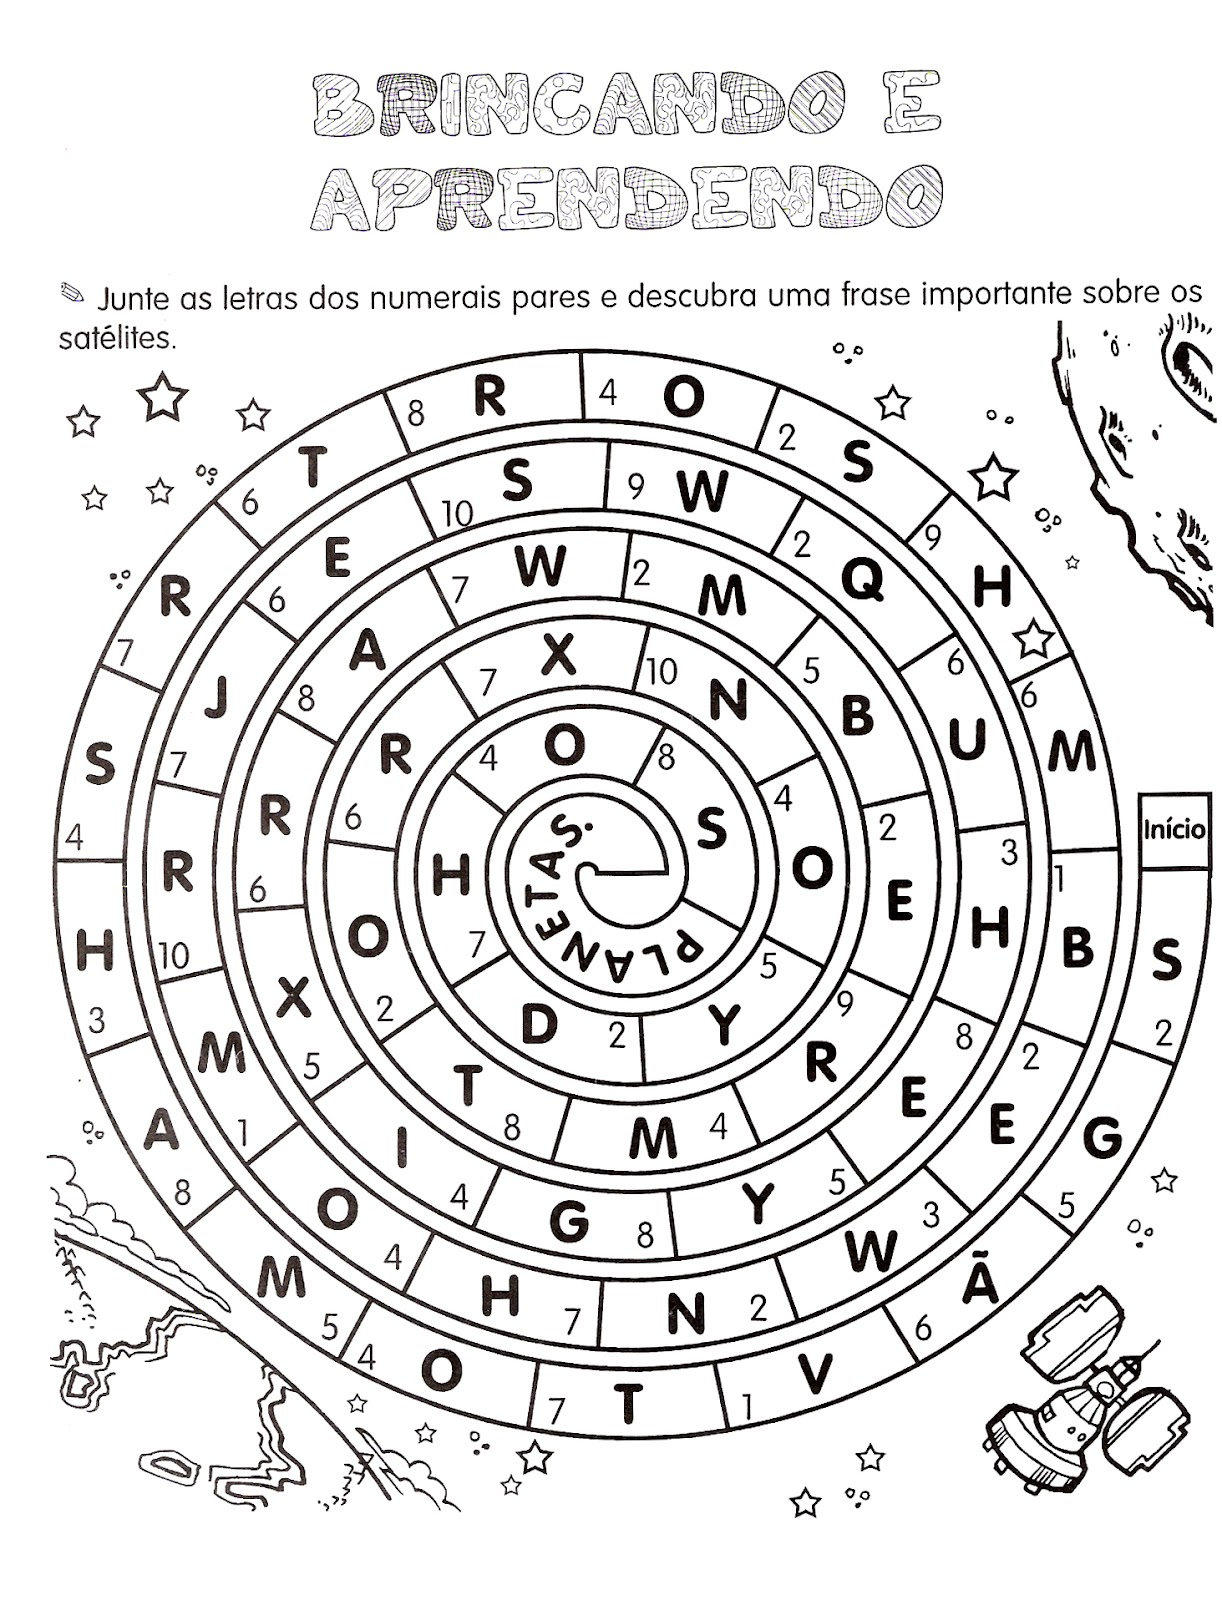 Amado Atividades sistema solar - Atividades Pedagógicas QN68